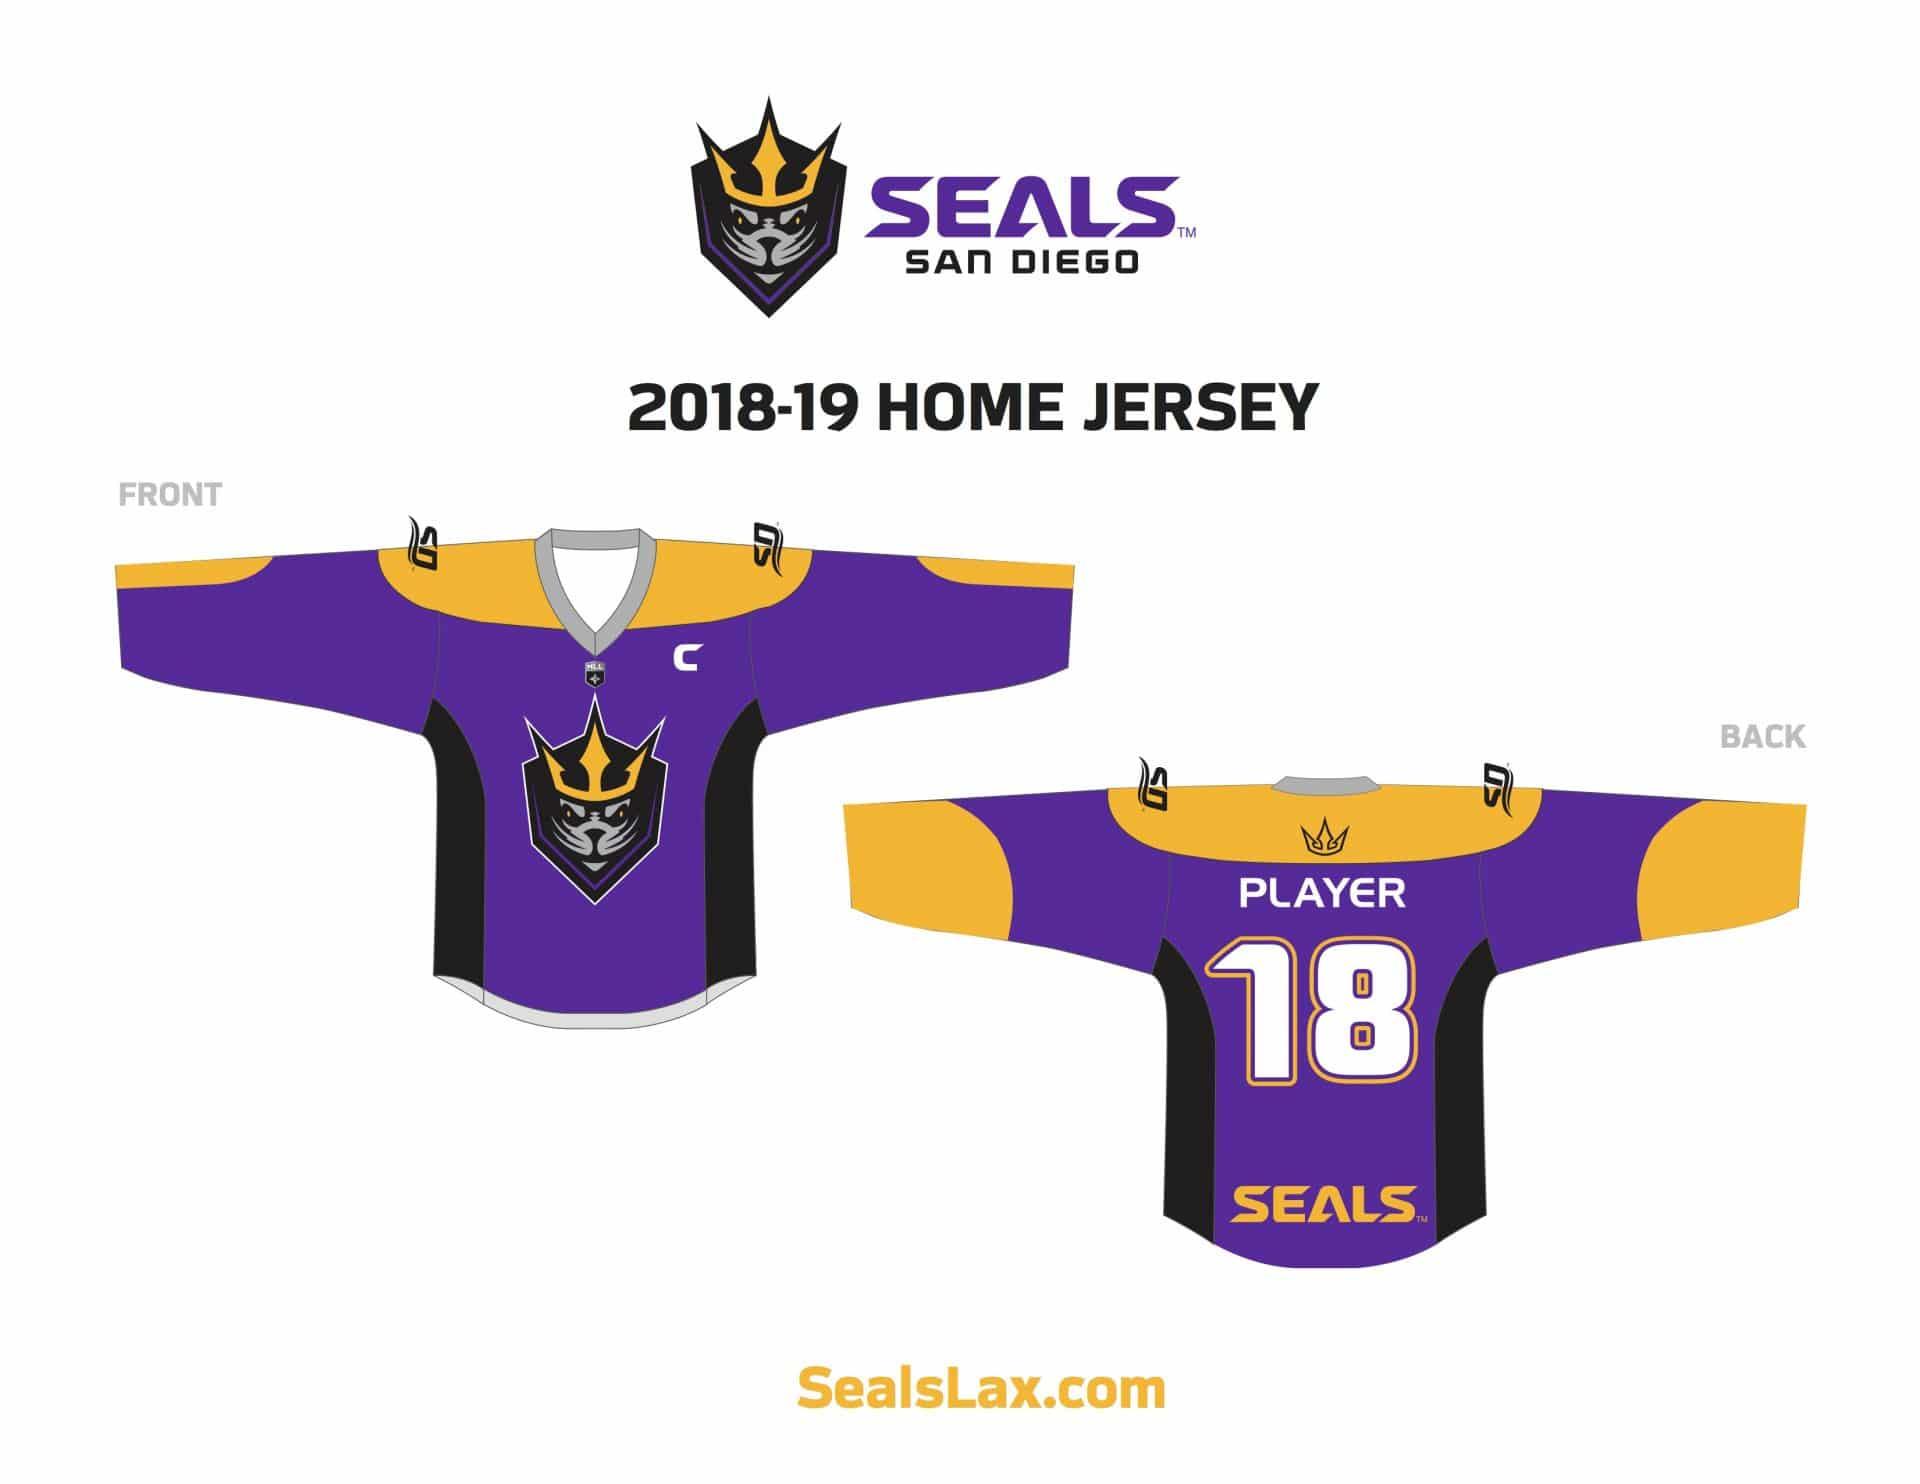 San Diego Seals Home Jersey graphic